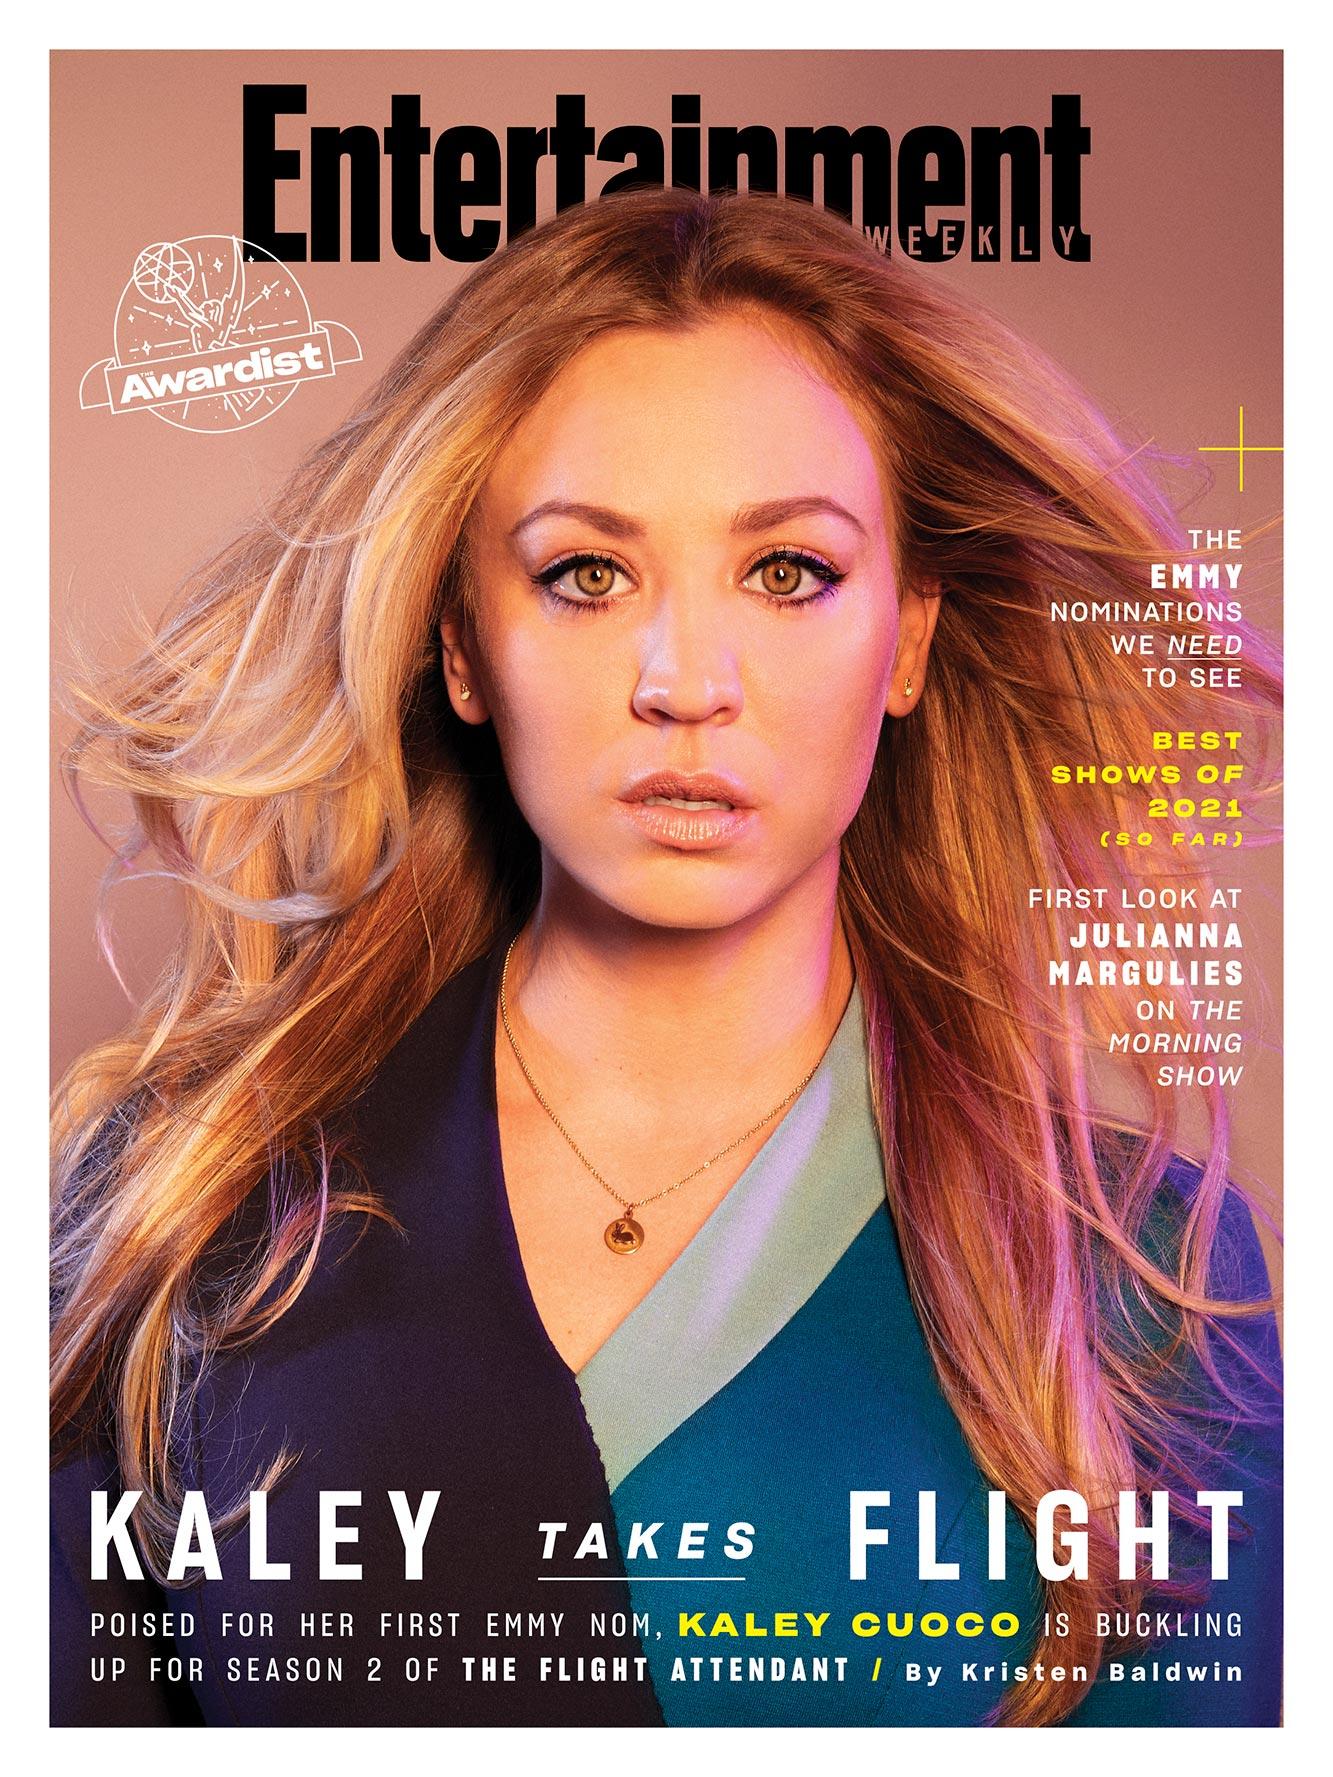 Kaley Cuoco July 2021 Flip EW Cover